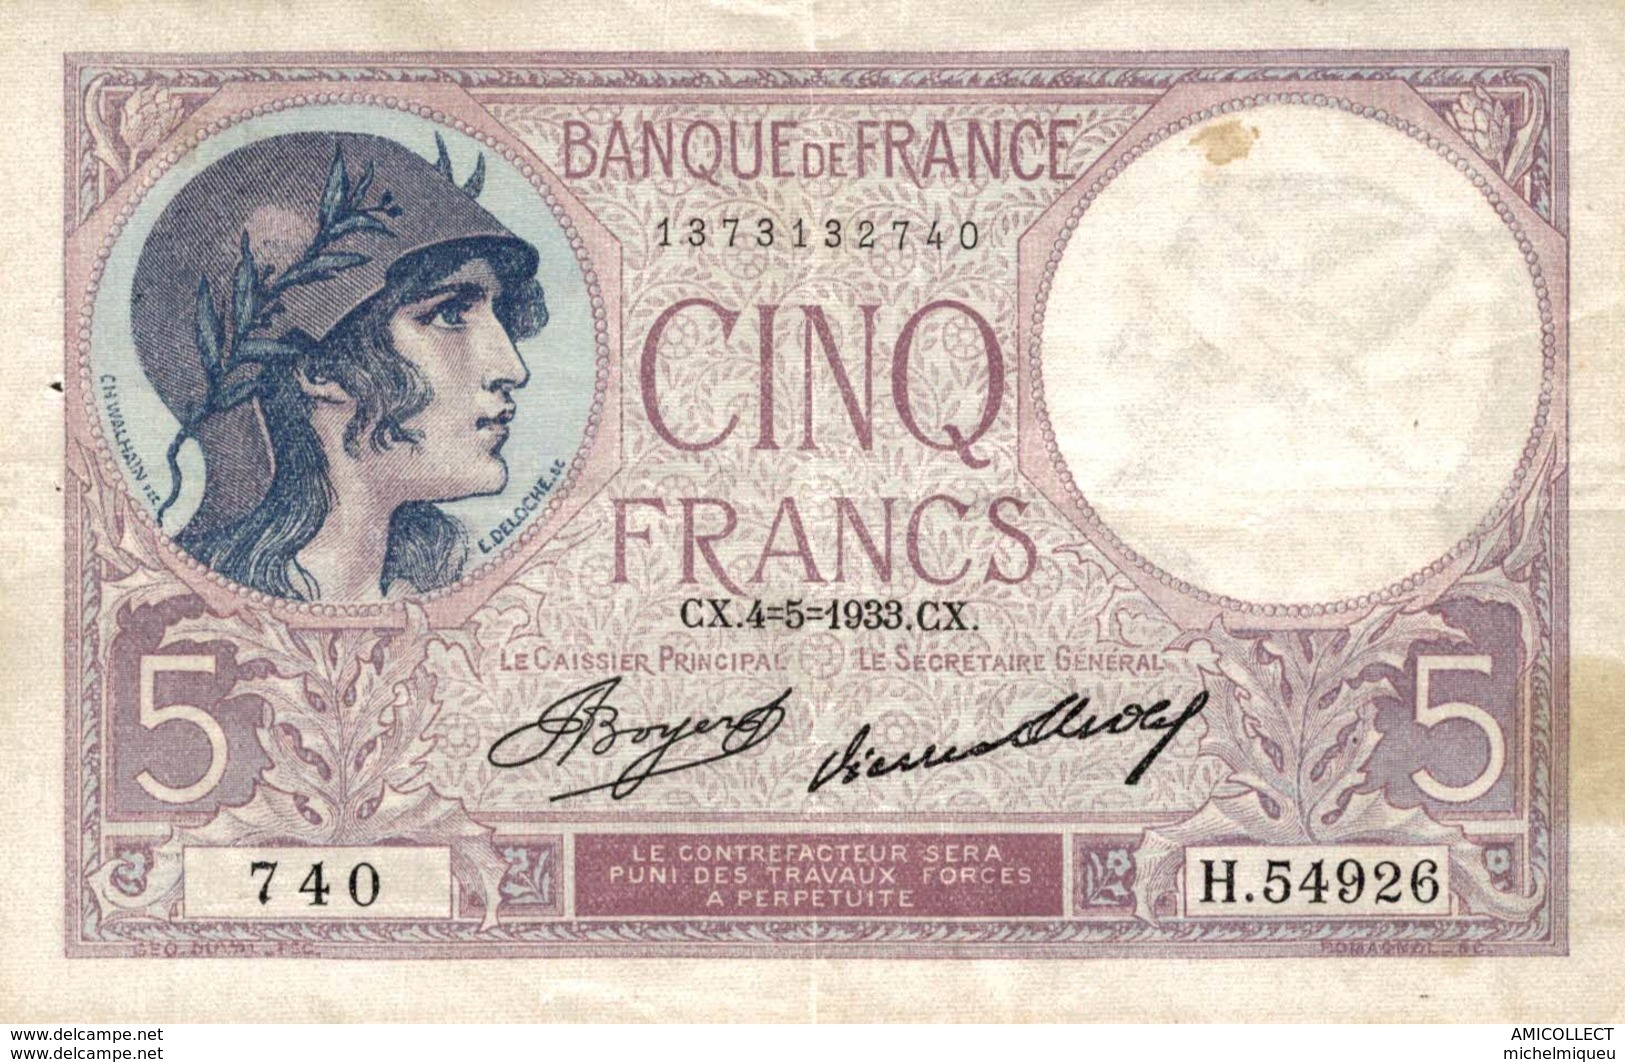 7753-2019    BILLET  DE BANQUE  FRANCAIS 5F VIOLET DU 4-5-1933 - 1871-1952 Antichi Franchi Circolanti Nel XX Secolo